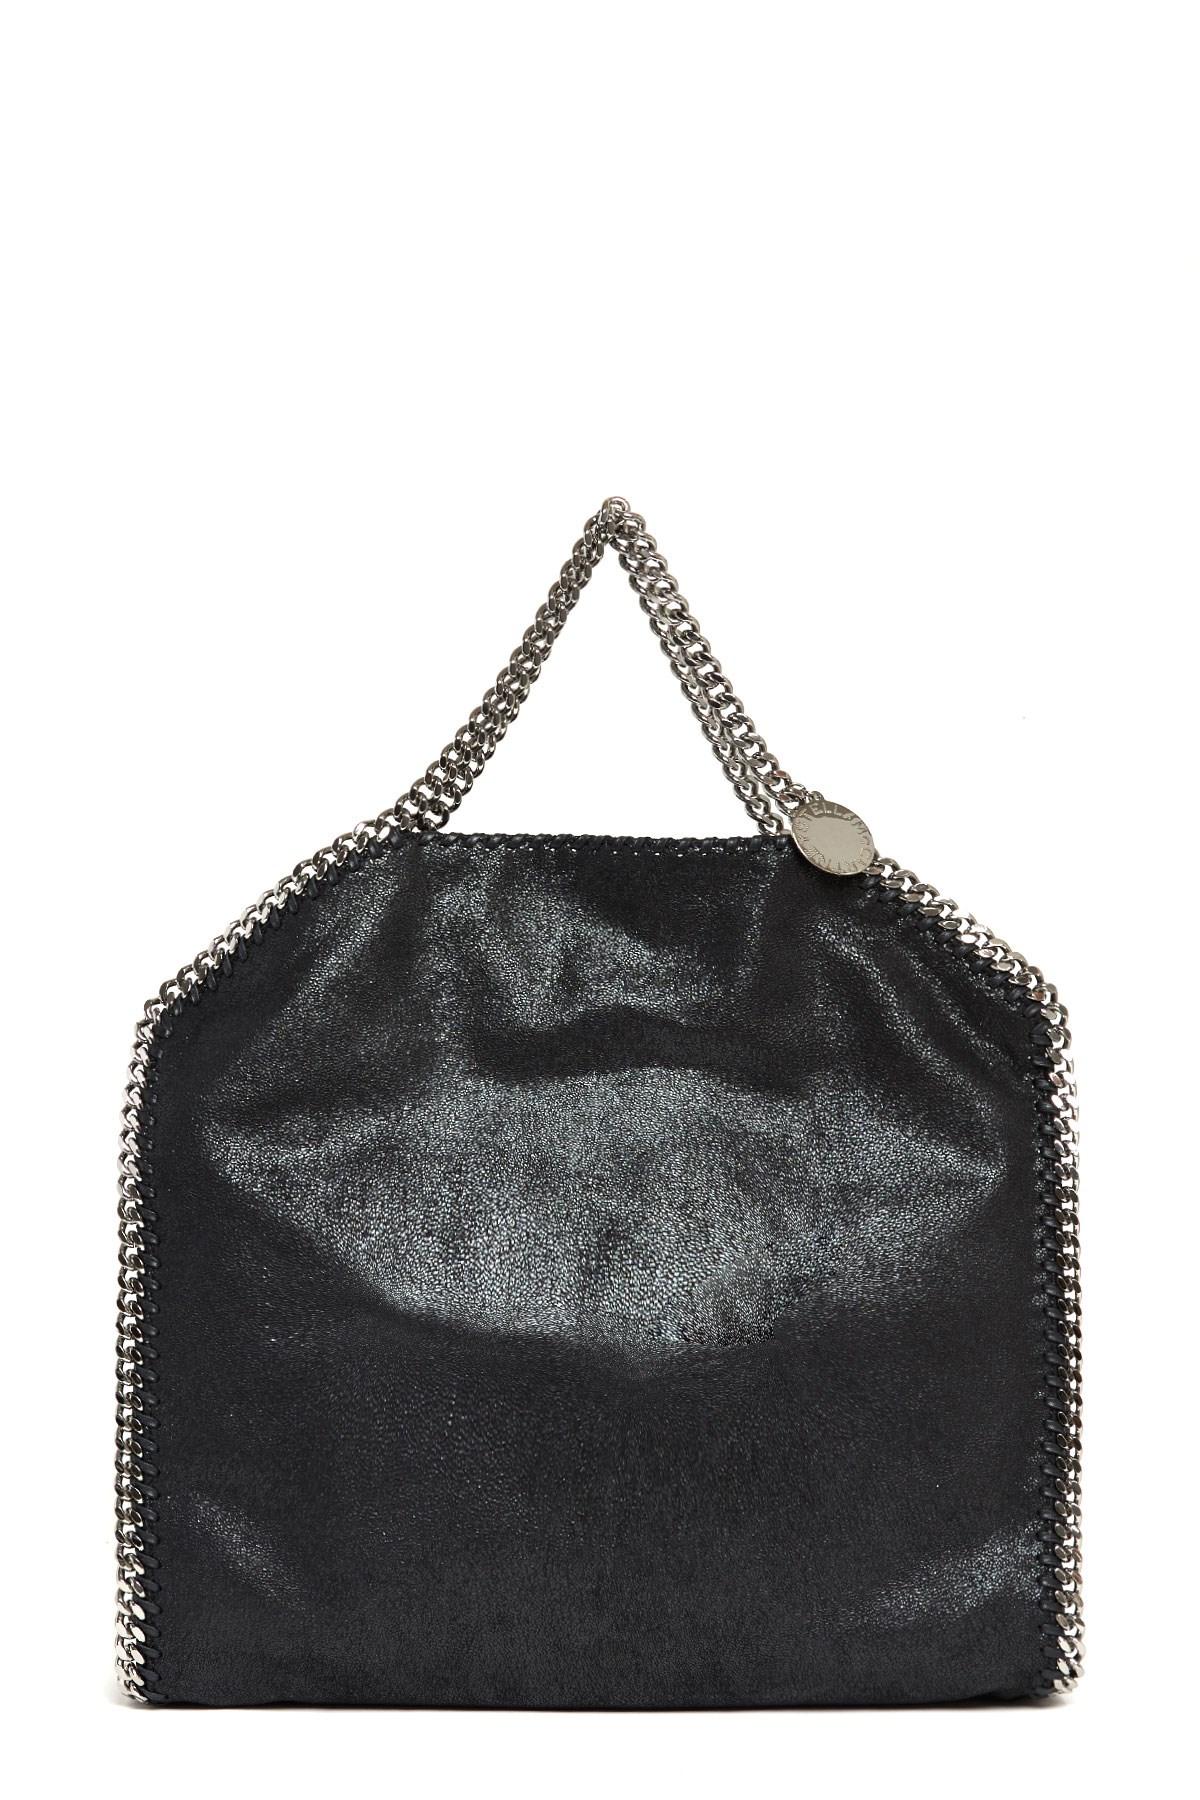 stella mccartney  Falabella  bag 3 chains available on julian ... 03bbc62bbc9